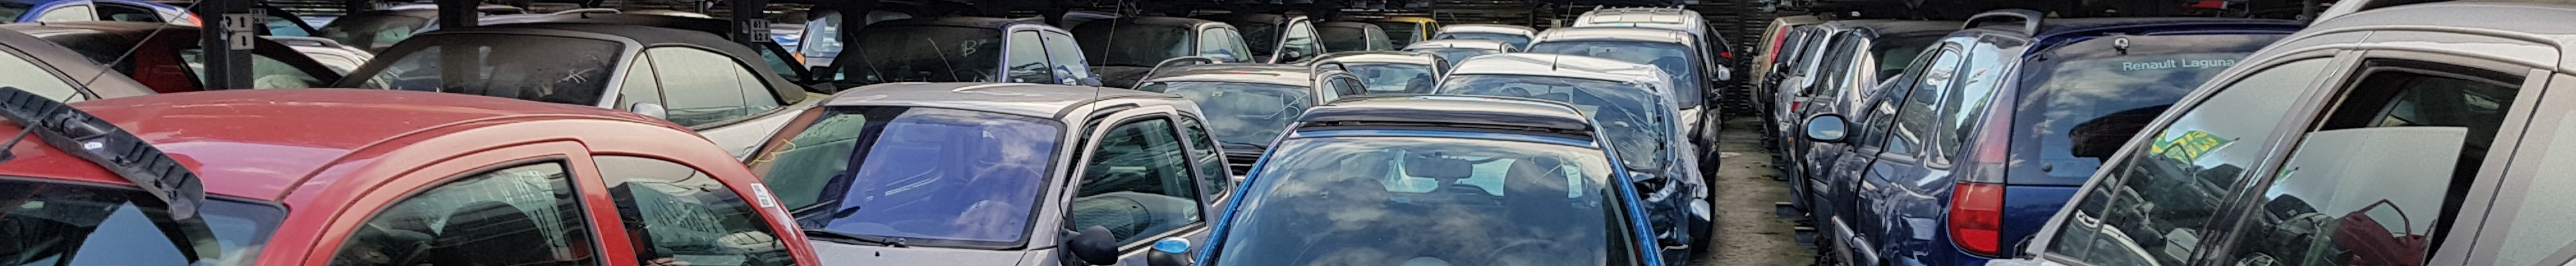 autoverwertung lensch gmbh autorecycling, autoteile, unfallfahrzeuge